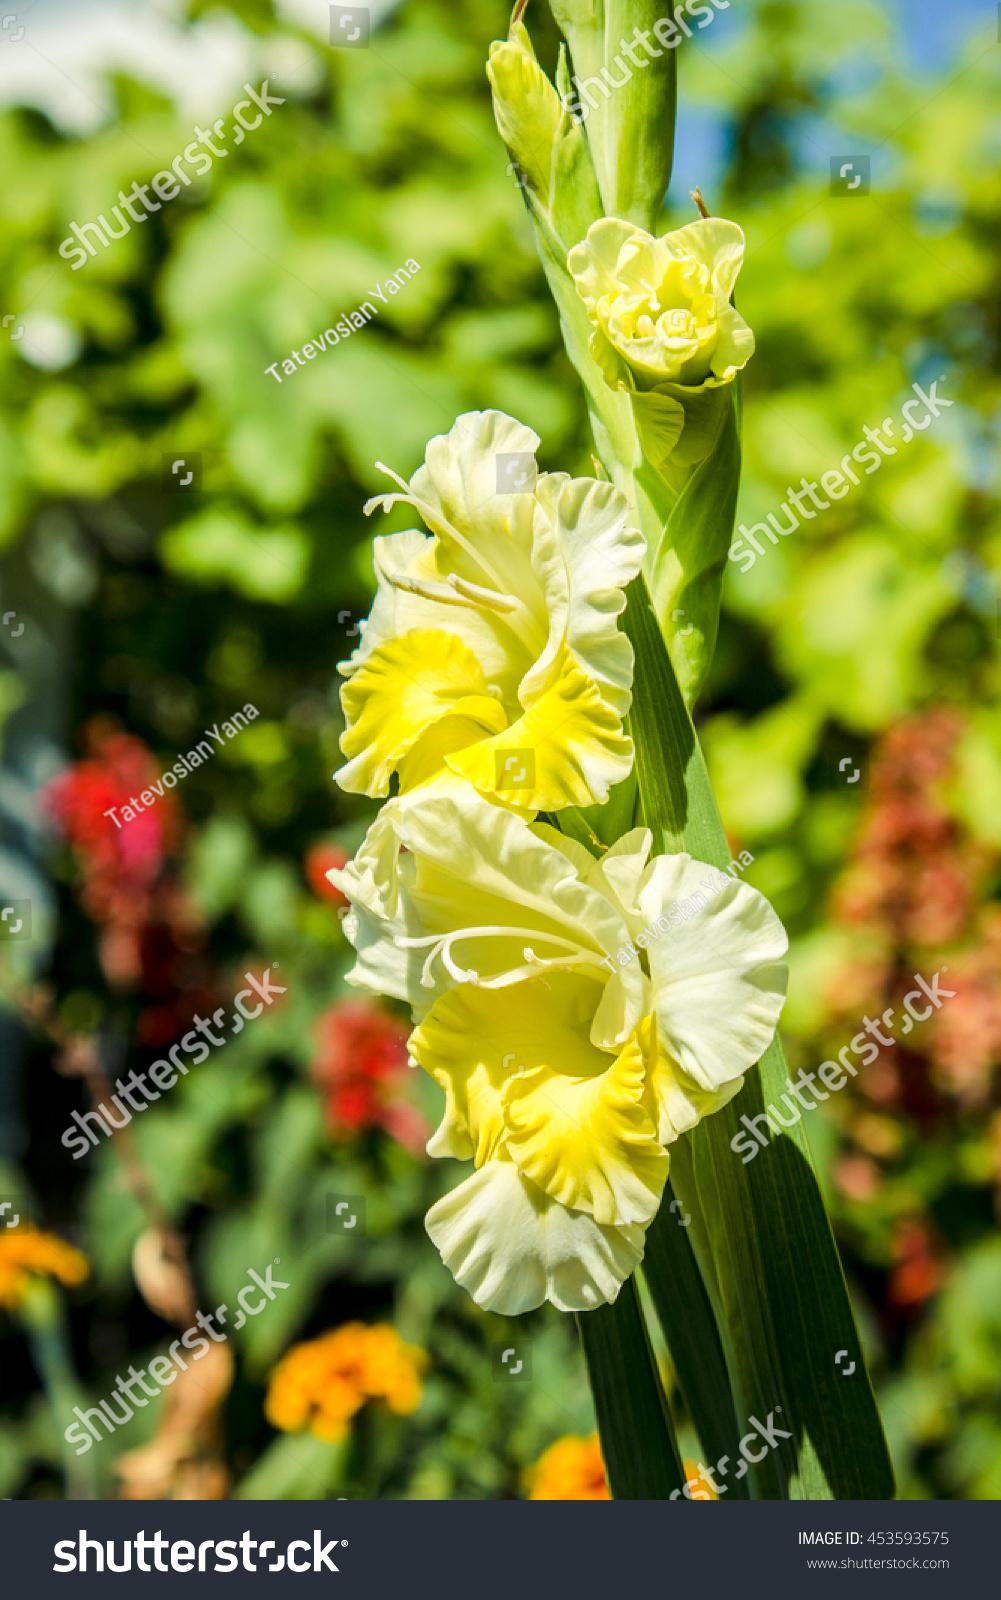 Gladiolus sword lily genus perennial bulbous stock photo edit now gladiolus sword lily a genus of perennial bulbous flowering plants in iris family iridaceae izmirmasajfo